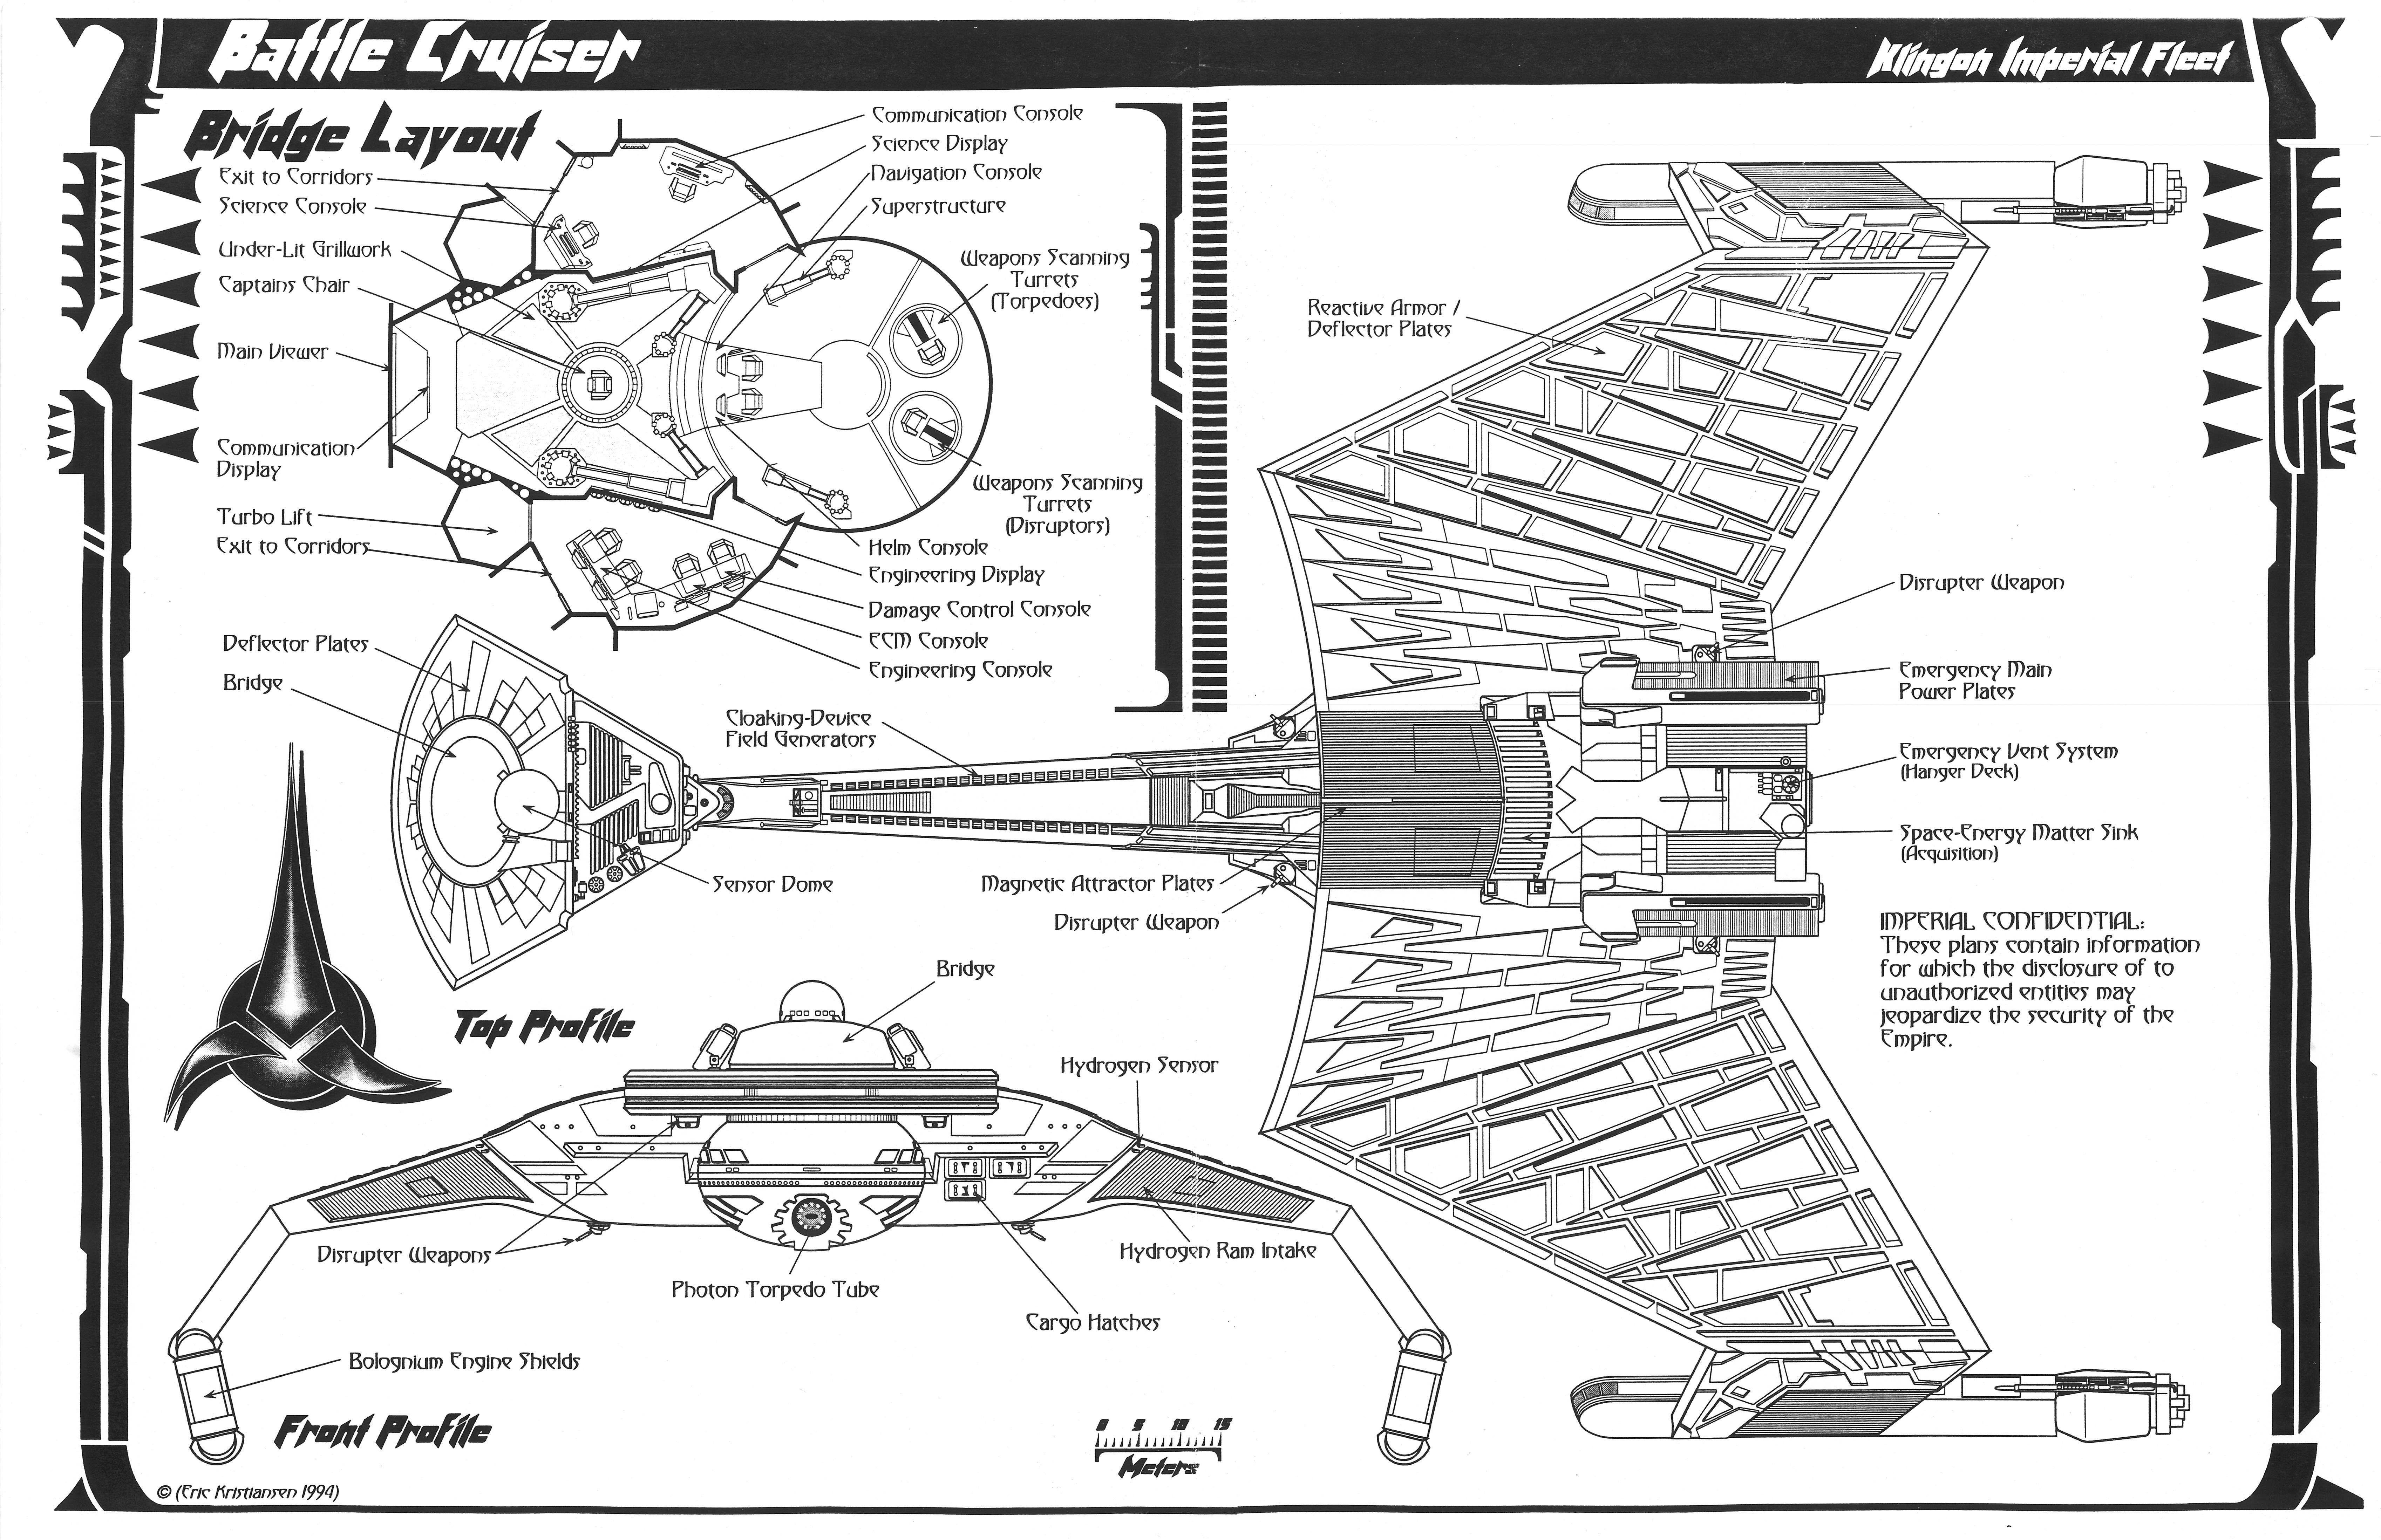 Klingon K T Inga Class Battle Cruiser